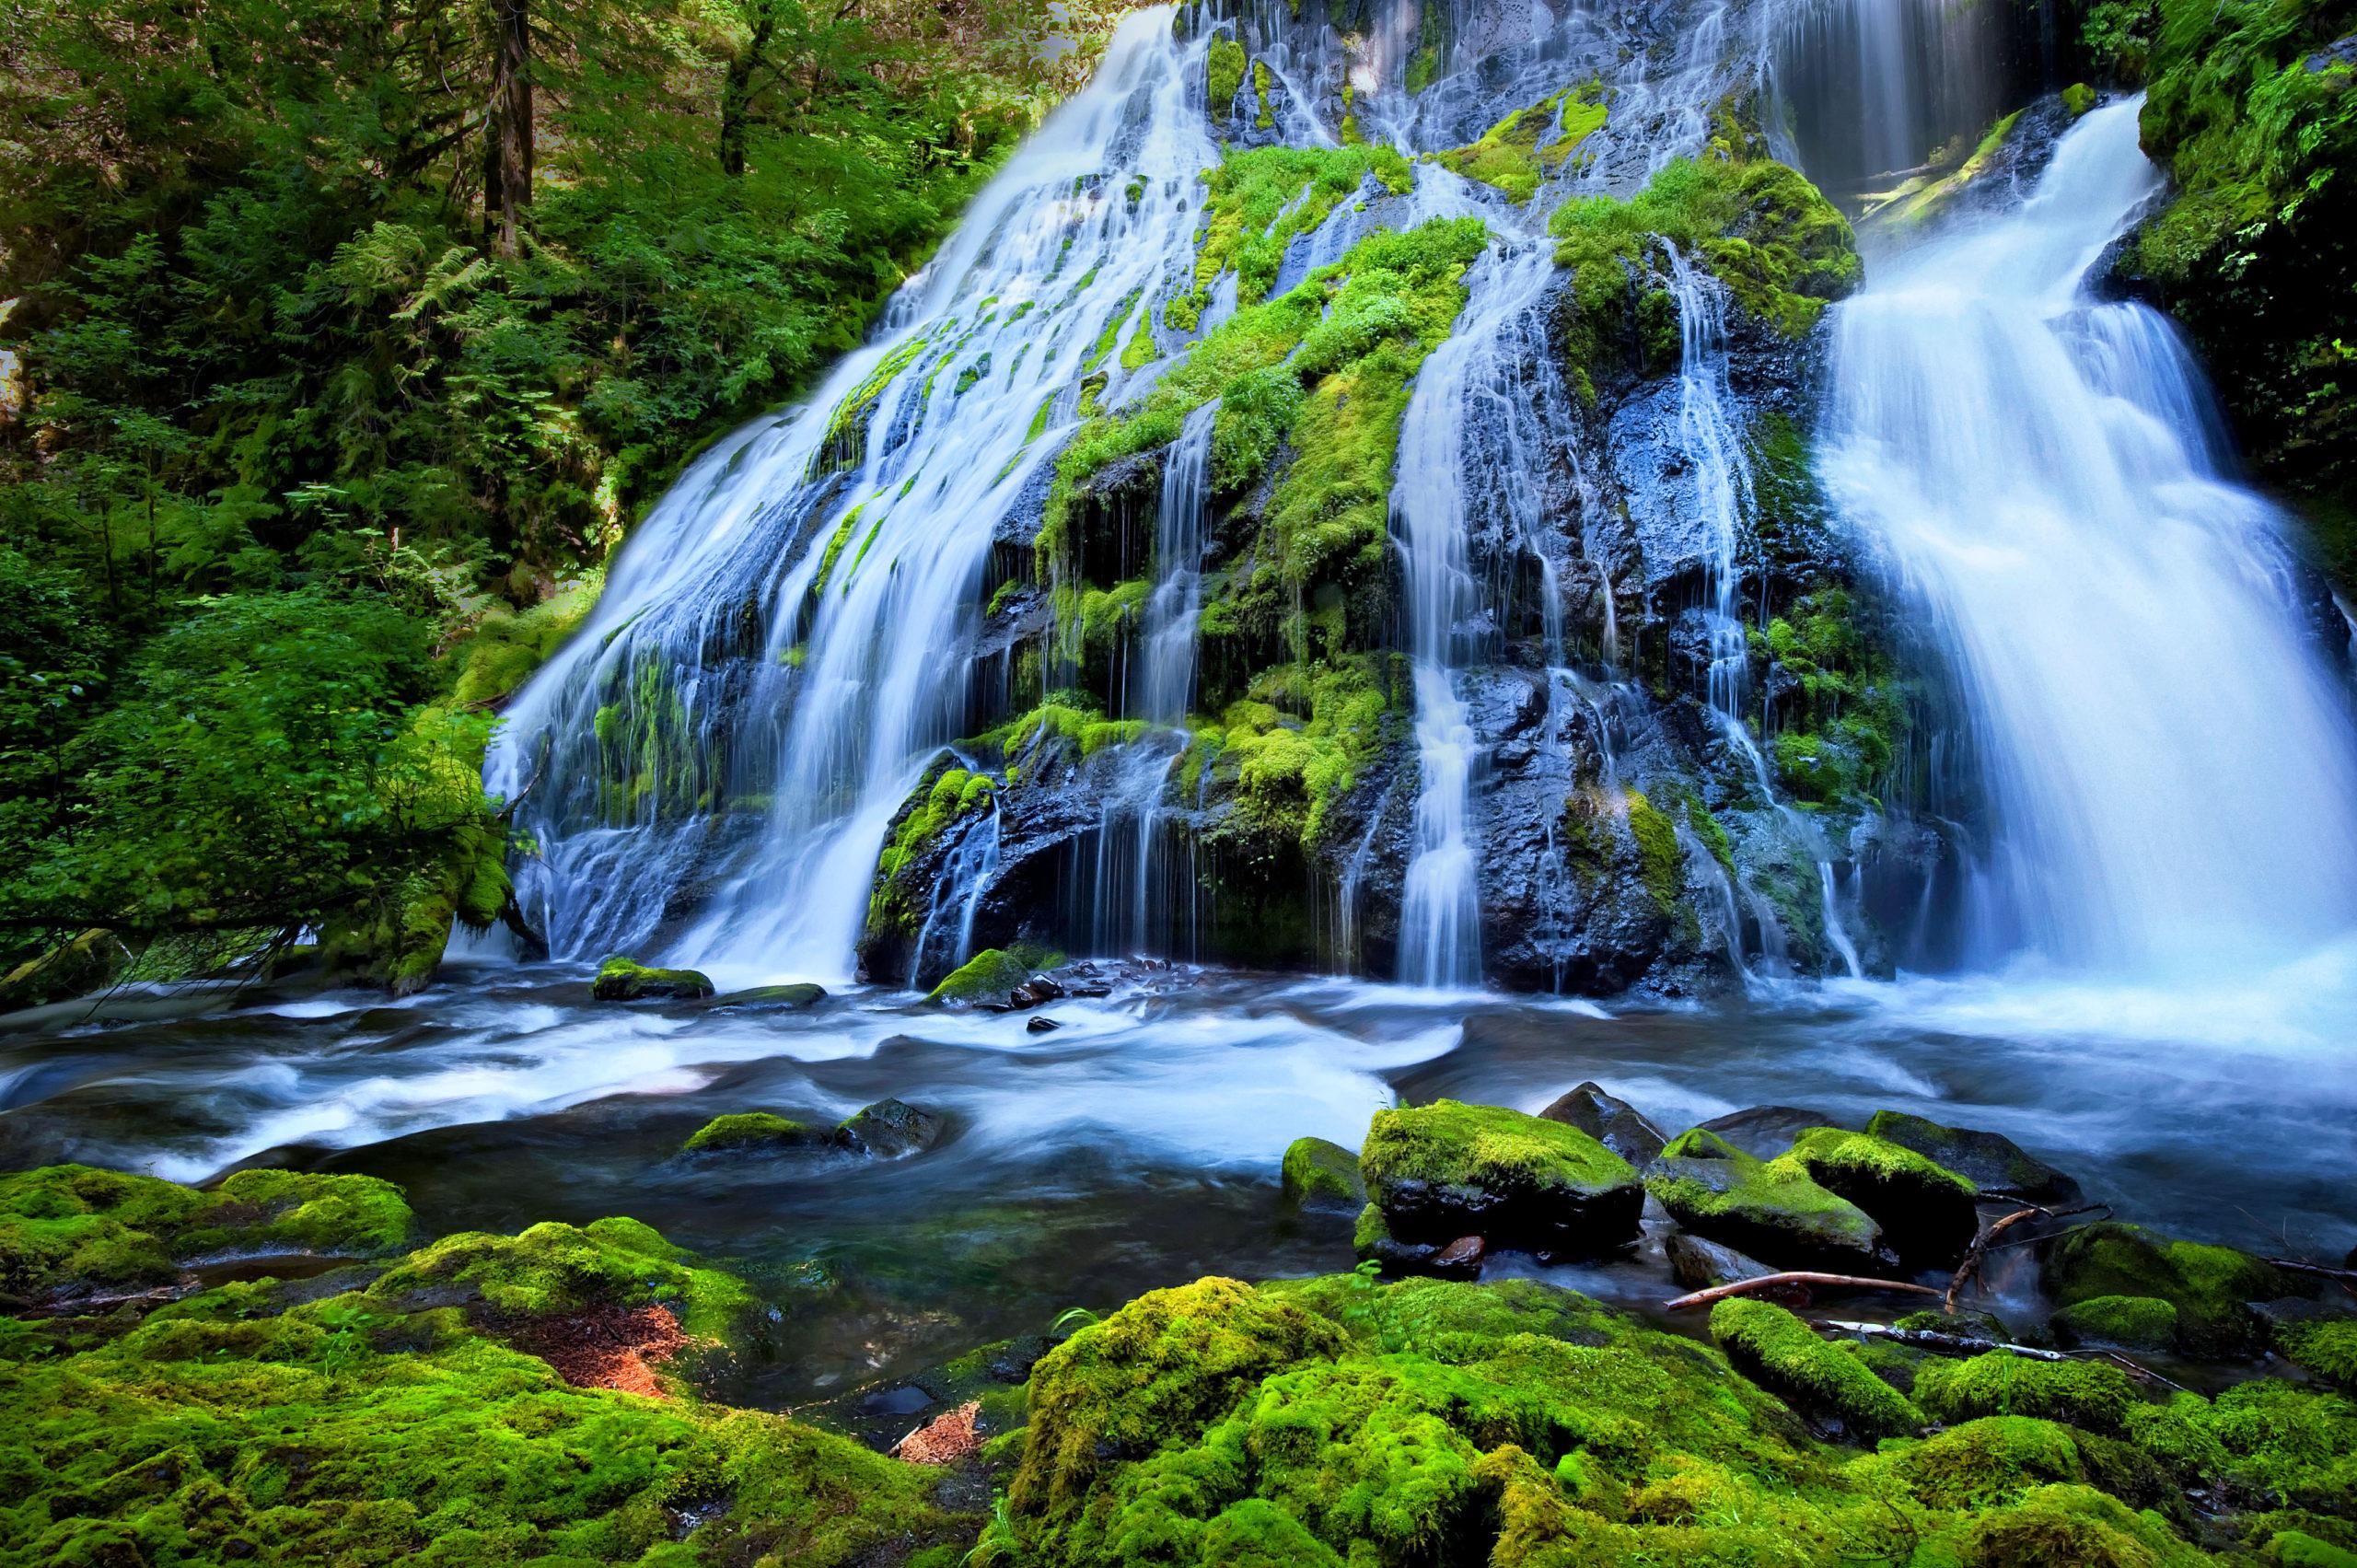 Site Seeing Waterfall In Portland, OR